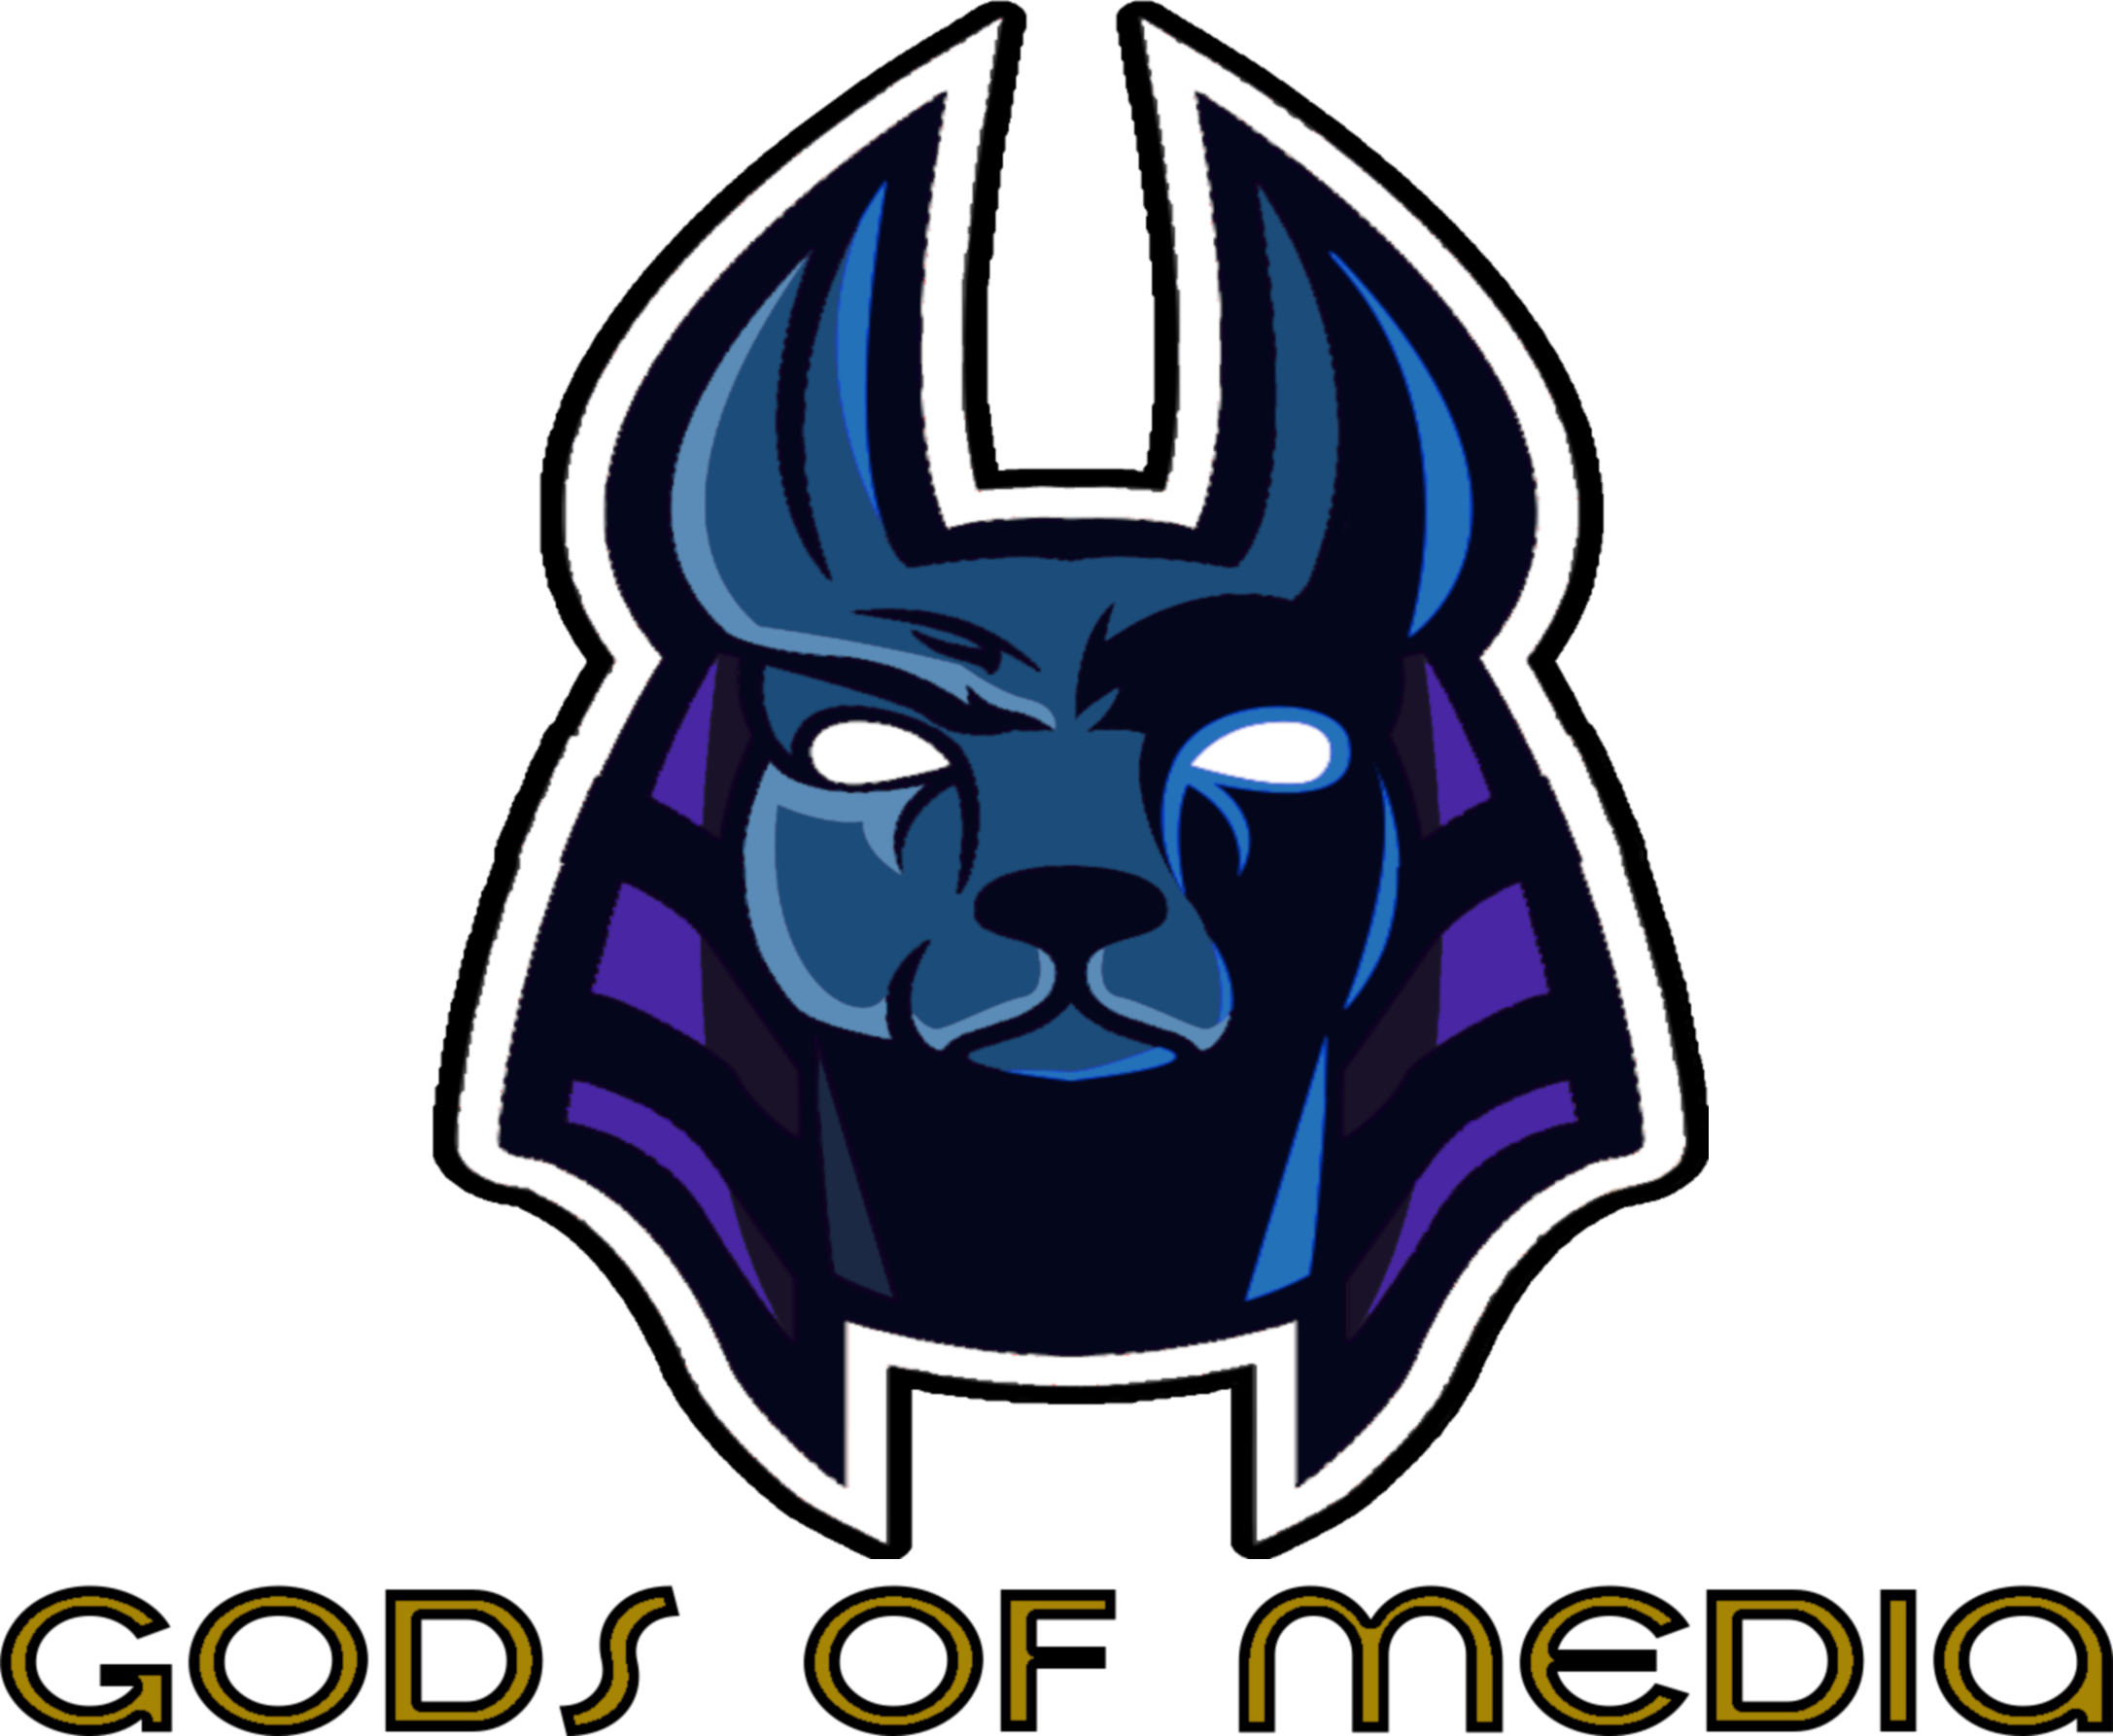 Gods Of Media